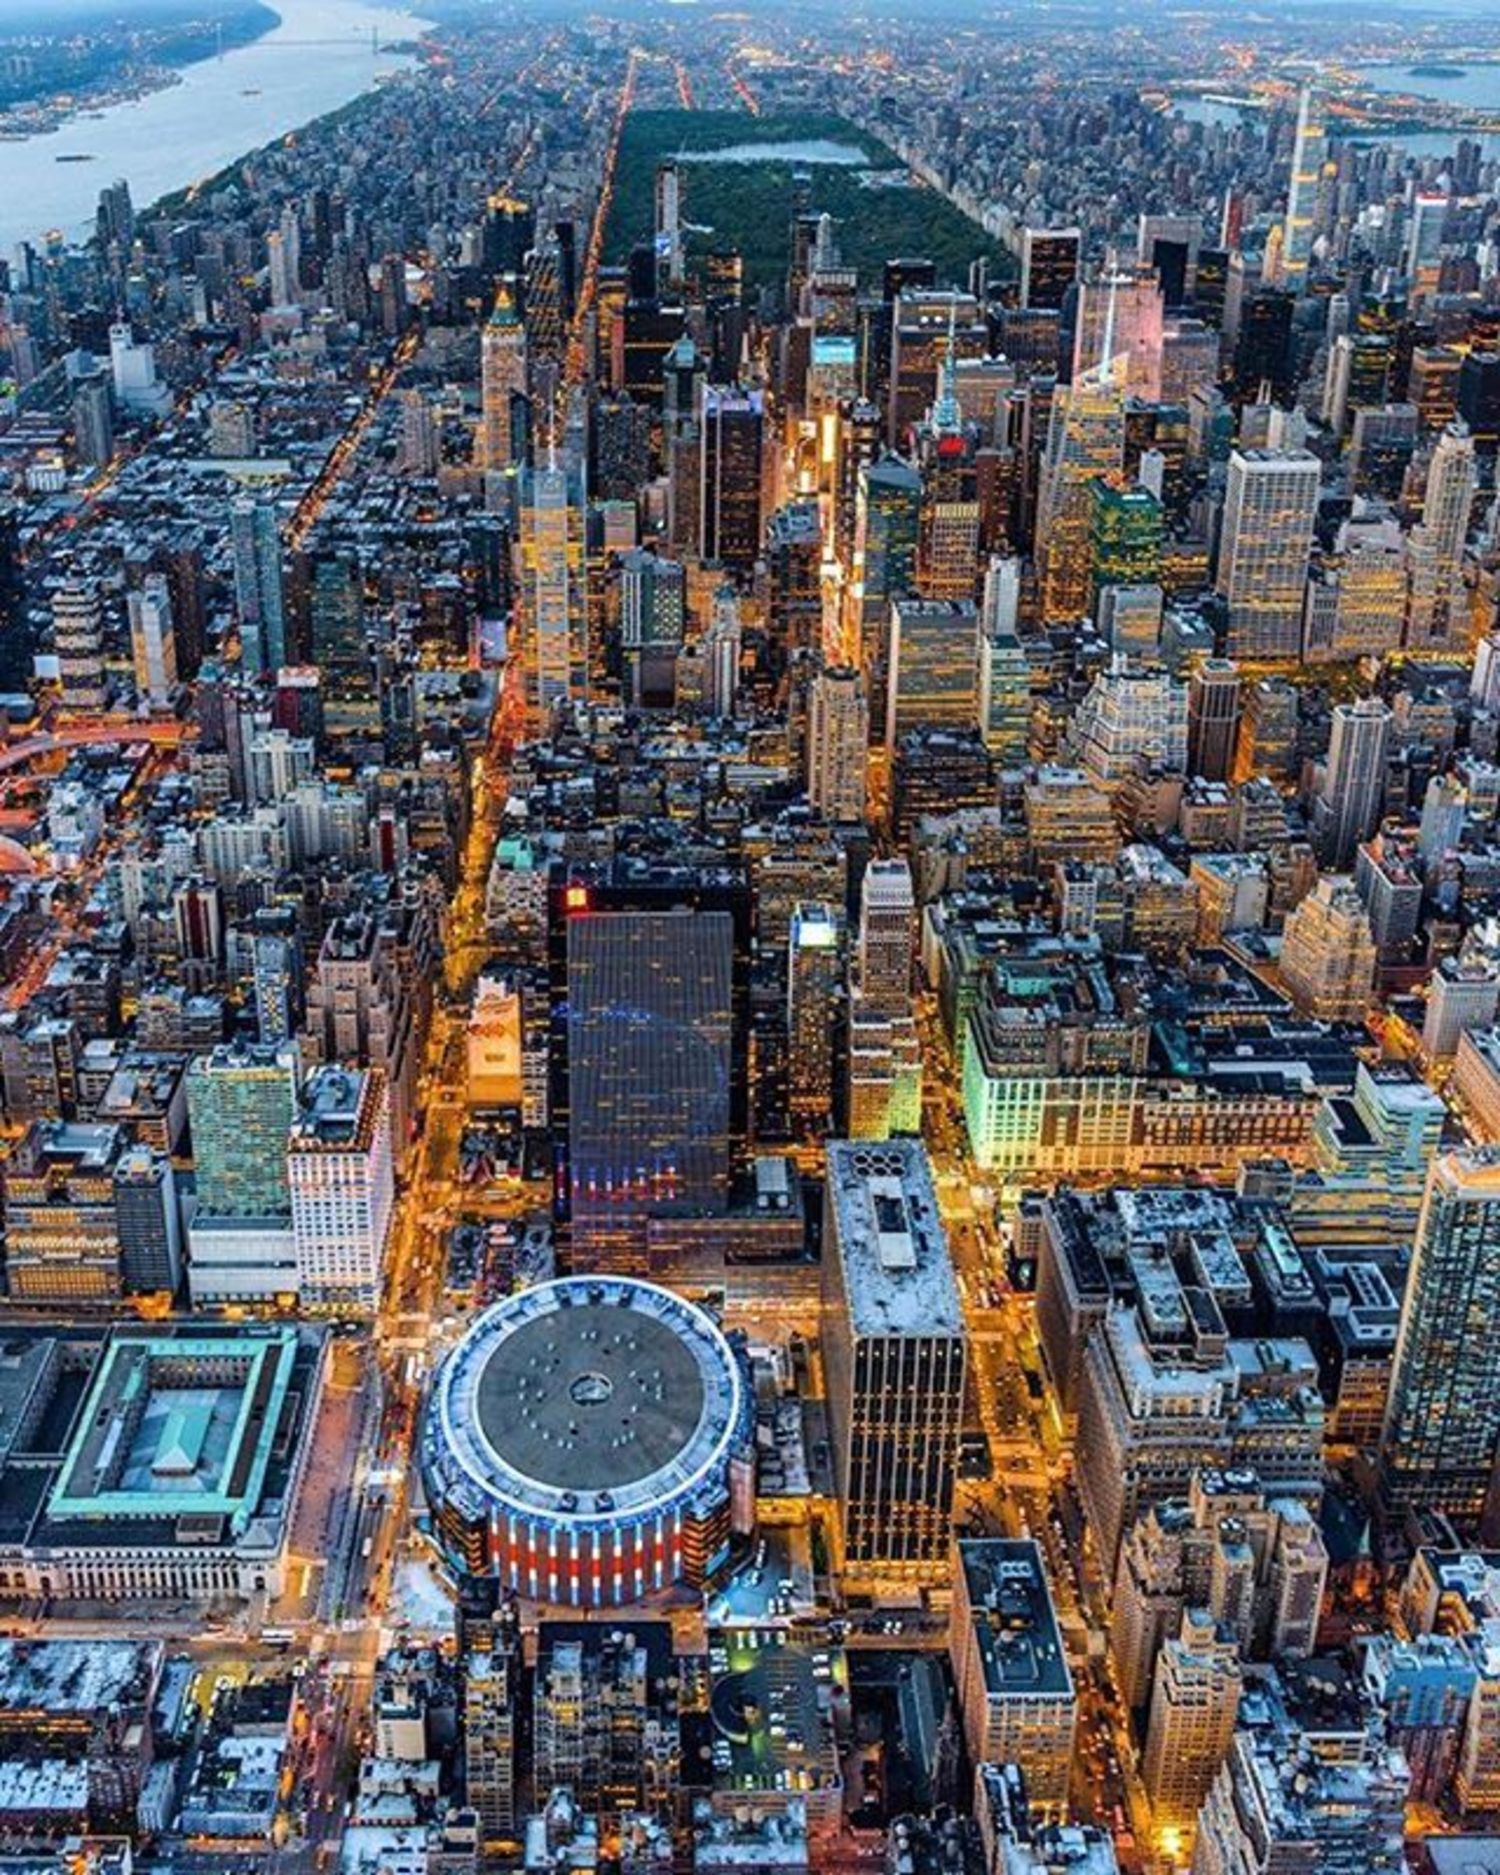 New York, New York. Photo via @killianmoore #viewingnyc